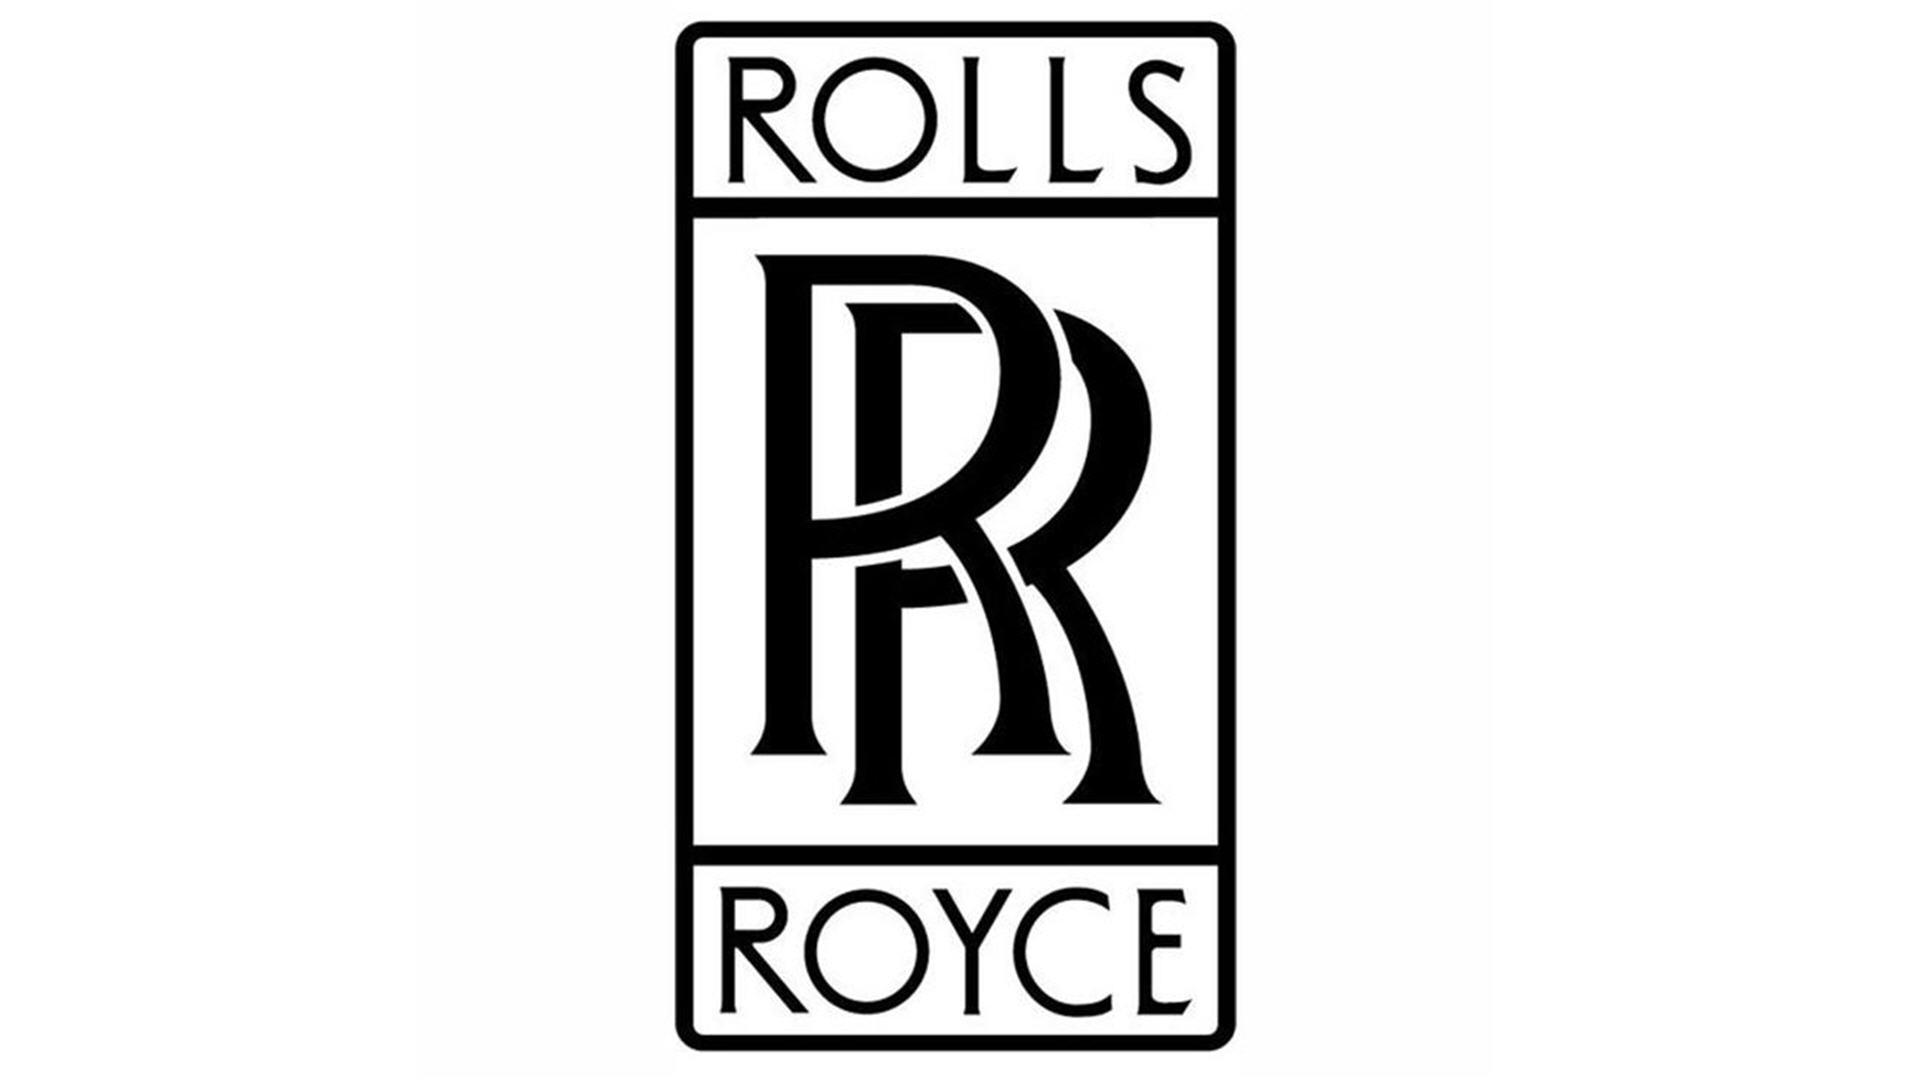 2014 rolls